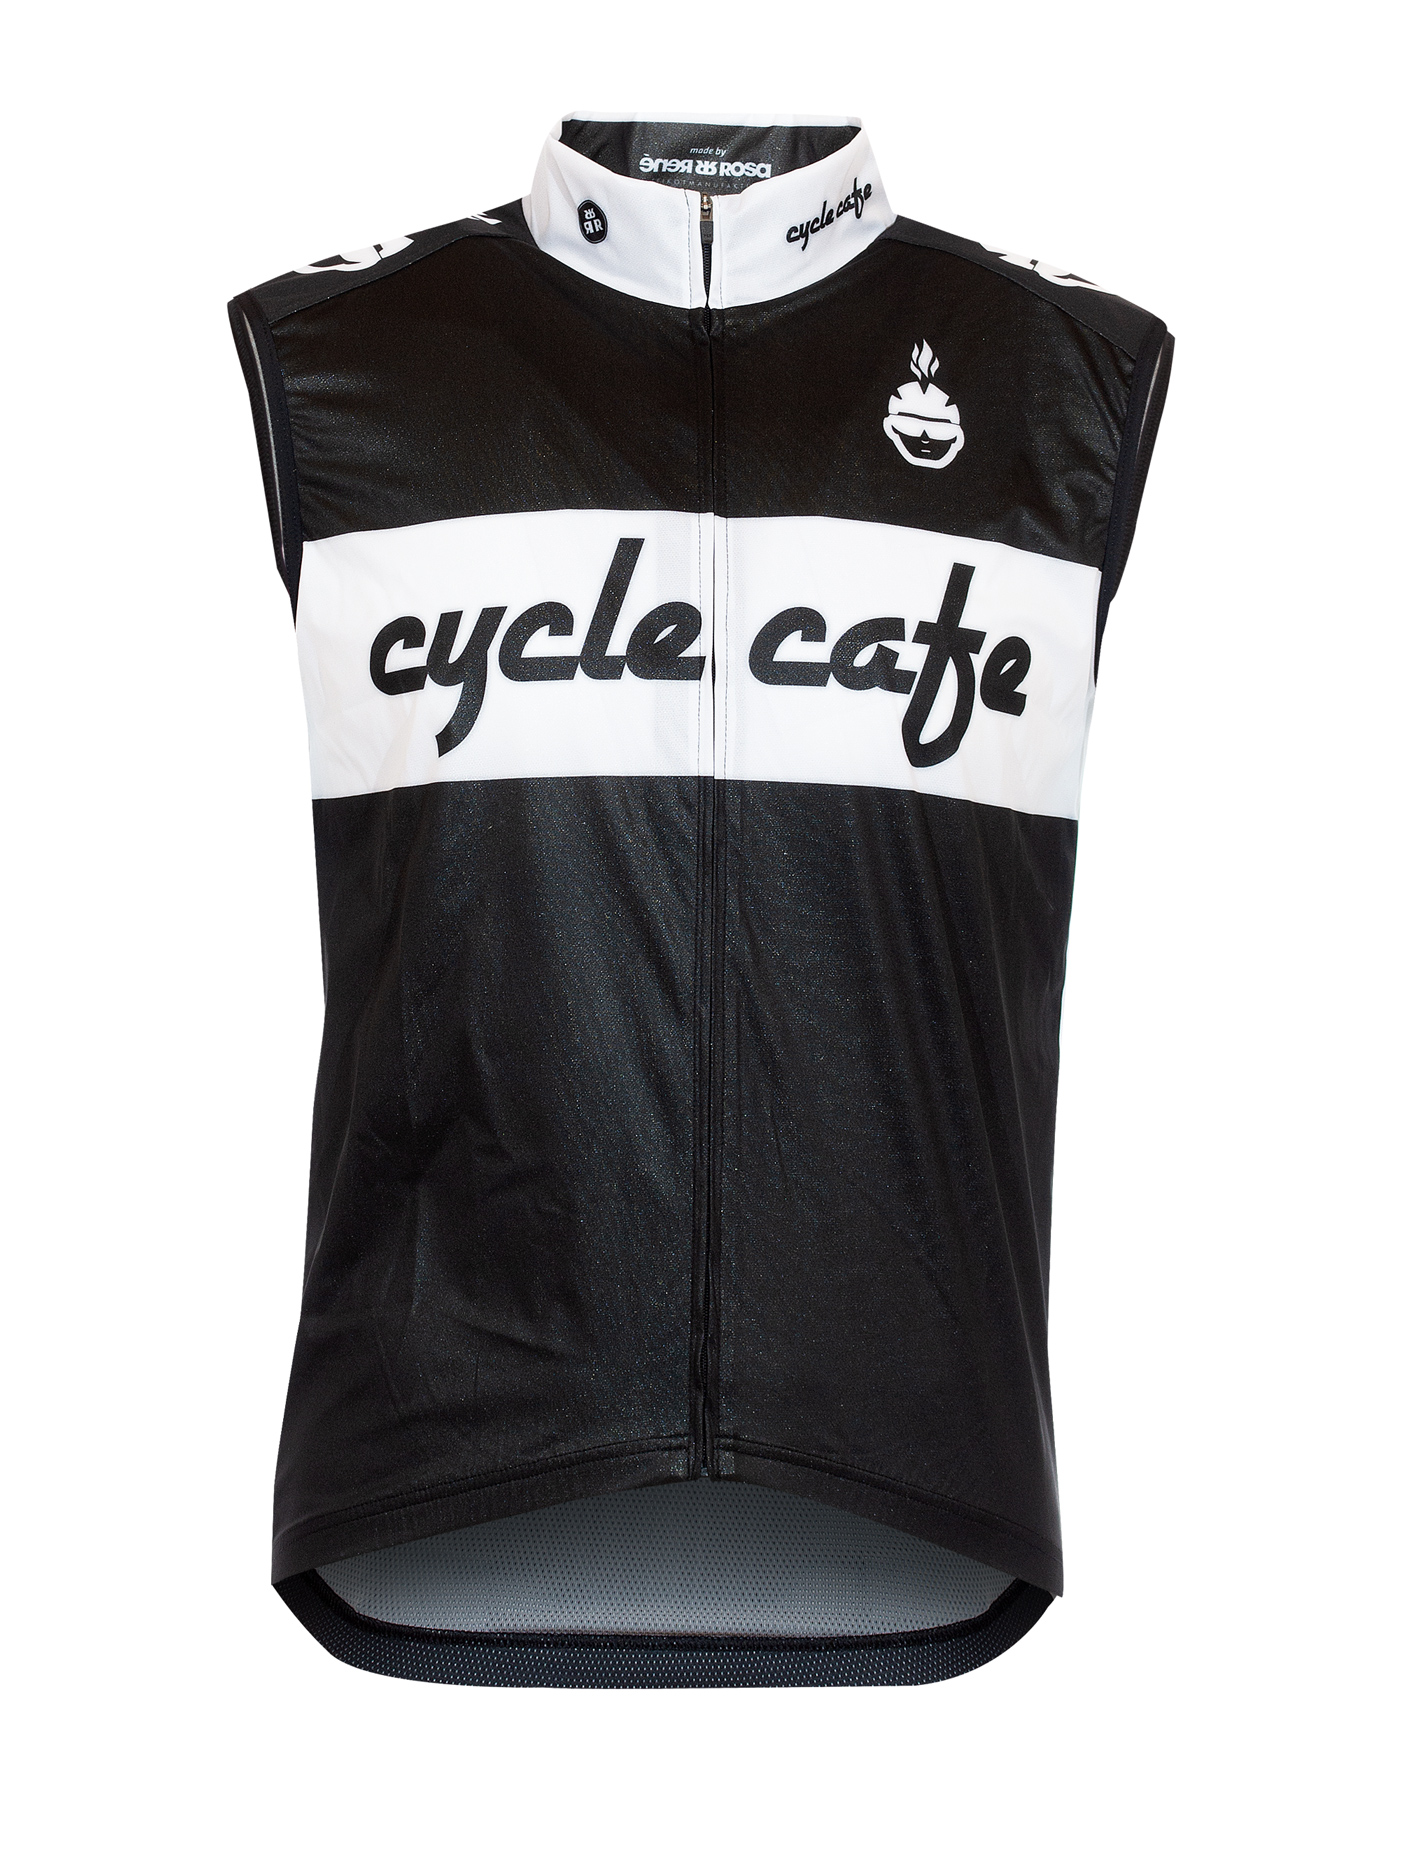 Windweste RRT101M / CycleCafe Classic Line